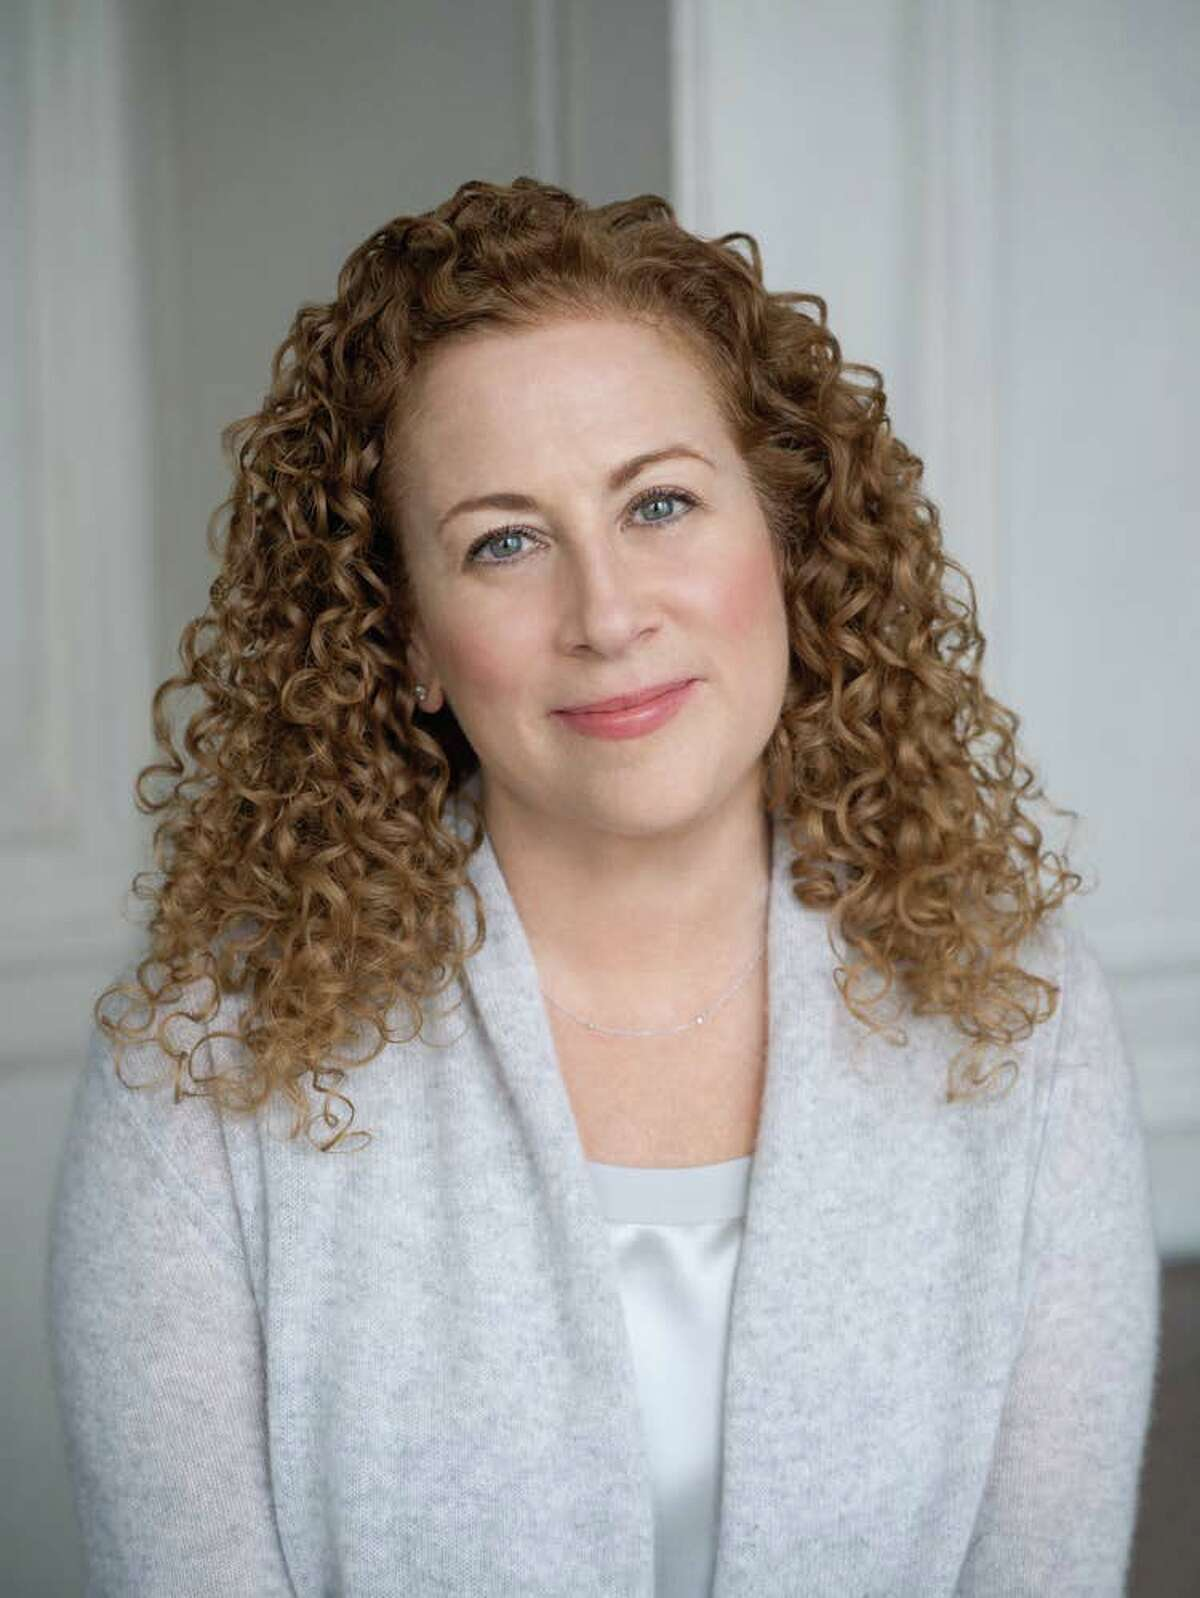 Author Jodi Picoult